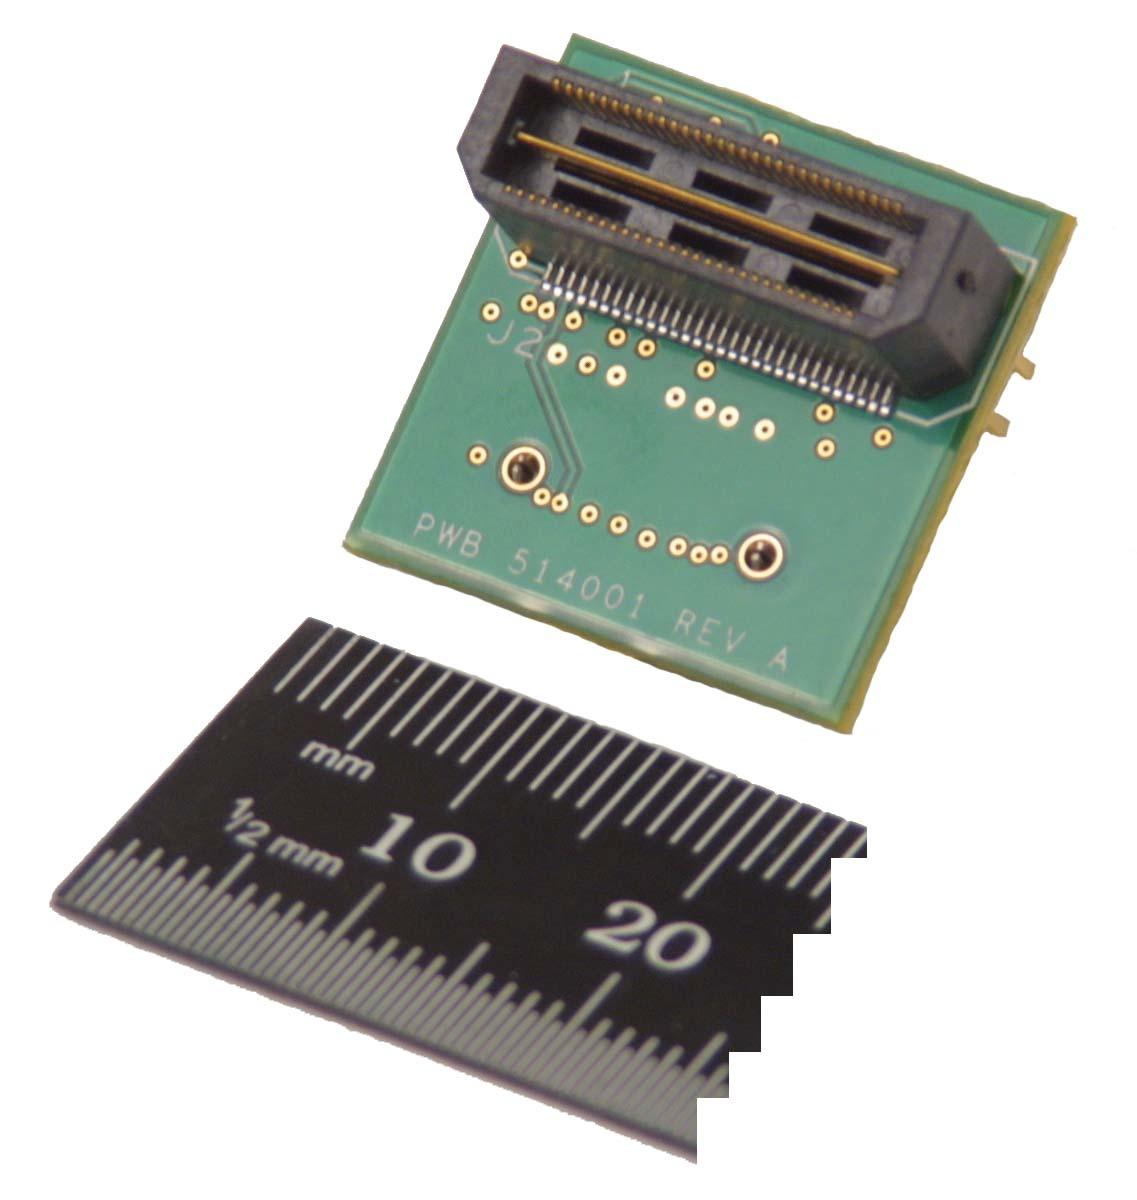 Resolved] EVMK2H: EVMK2H connections adapter to JTAG emulator